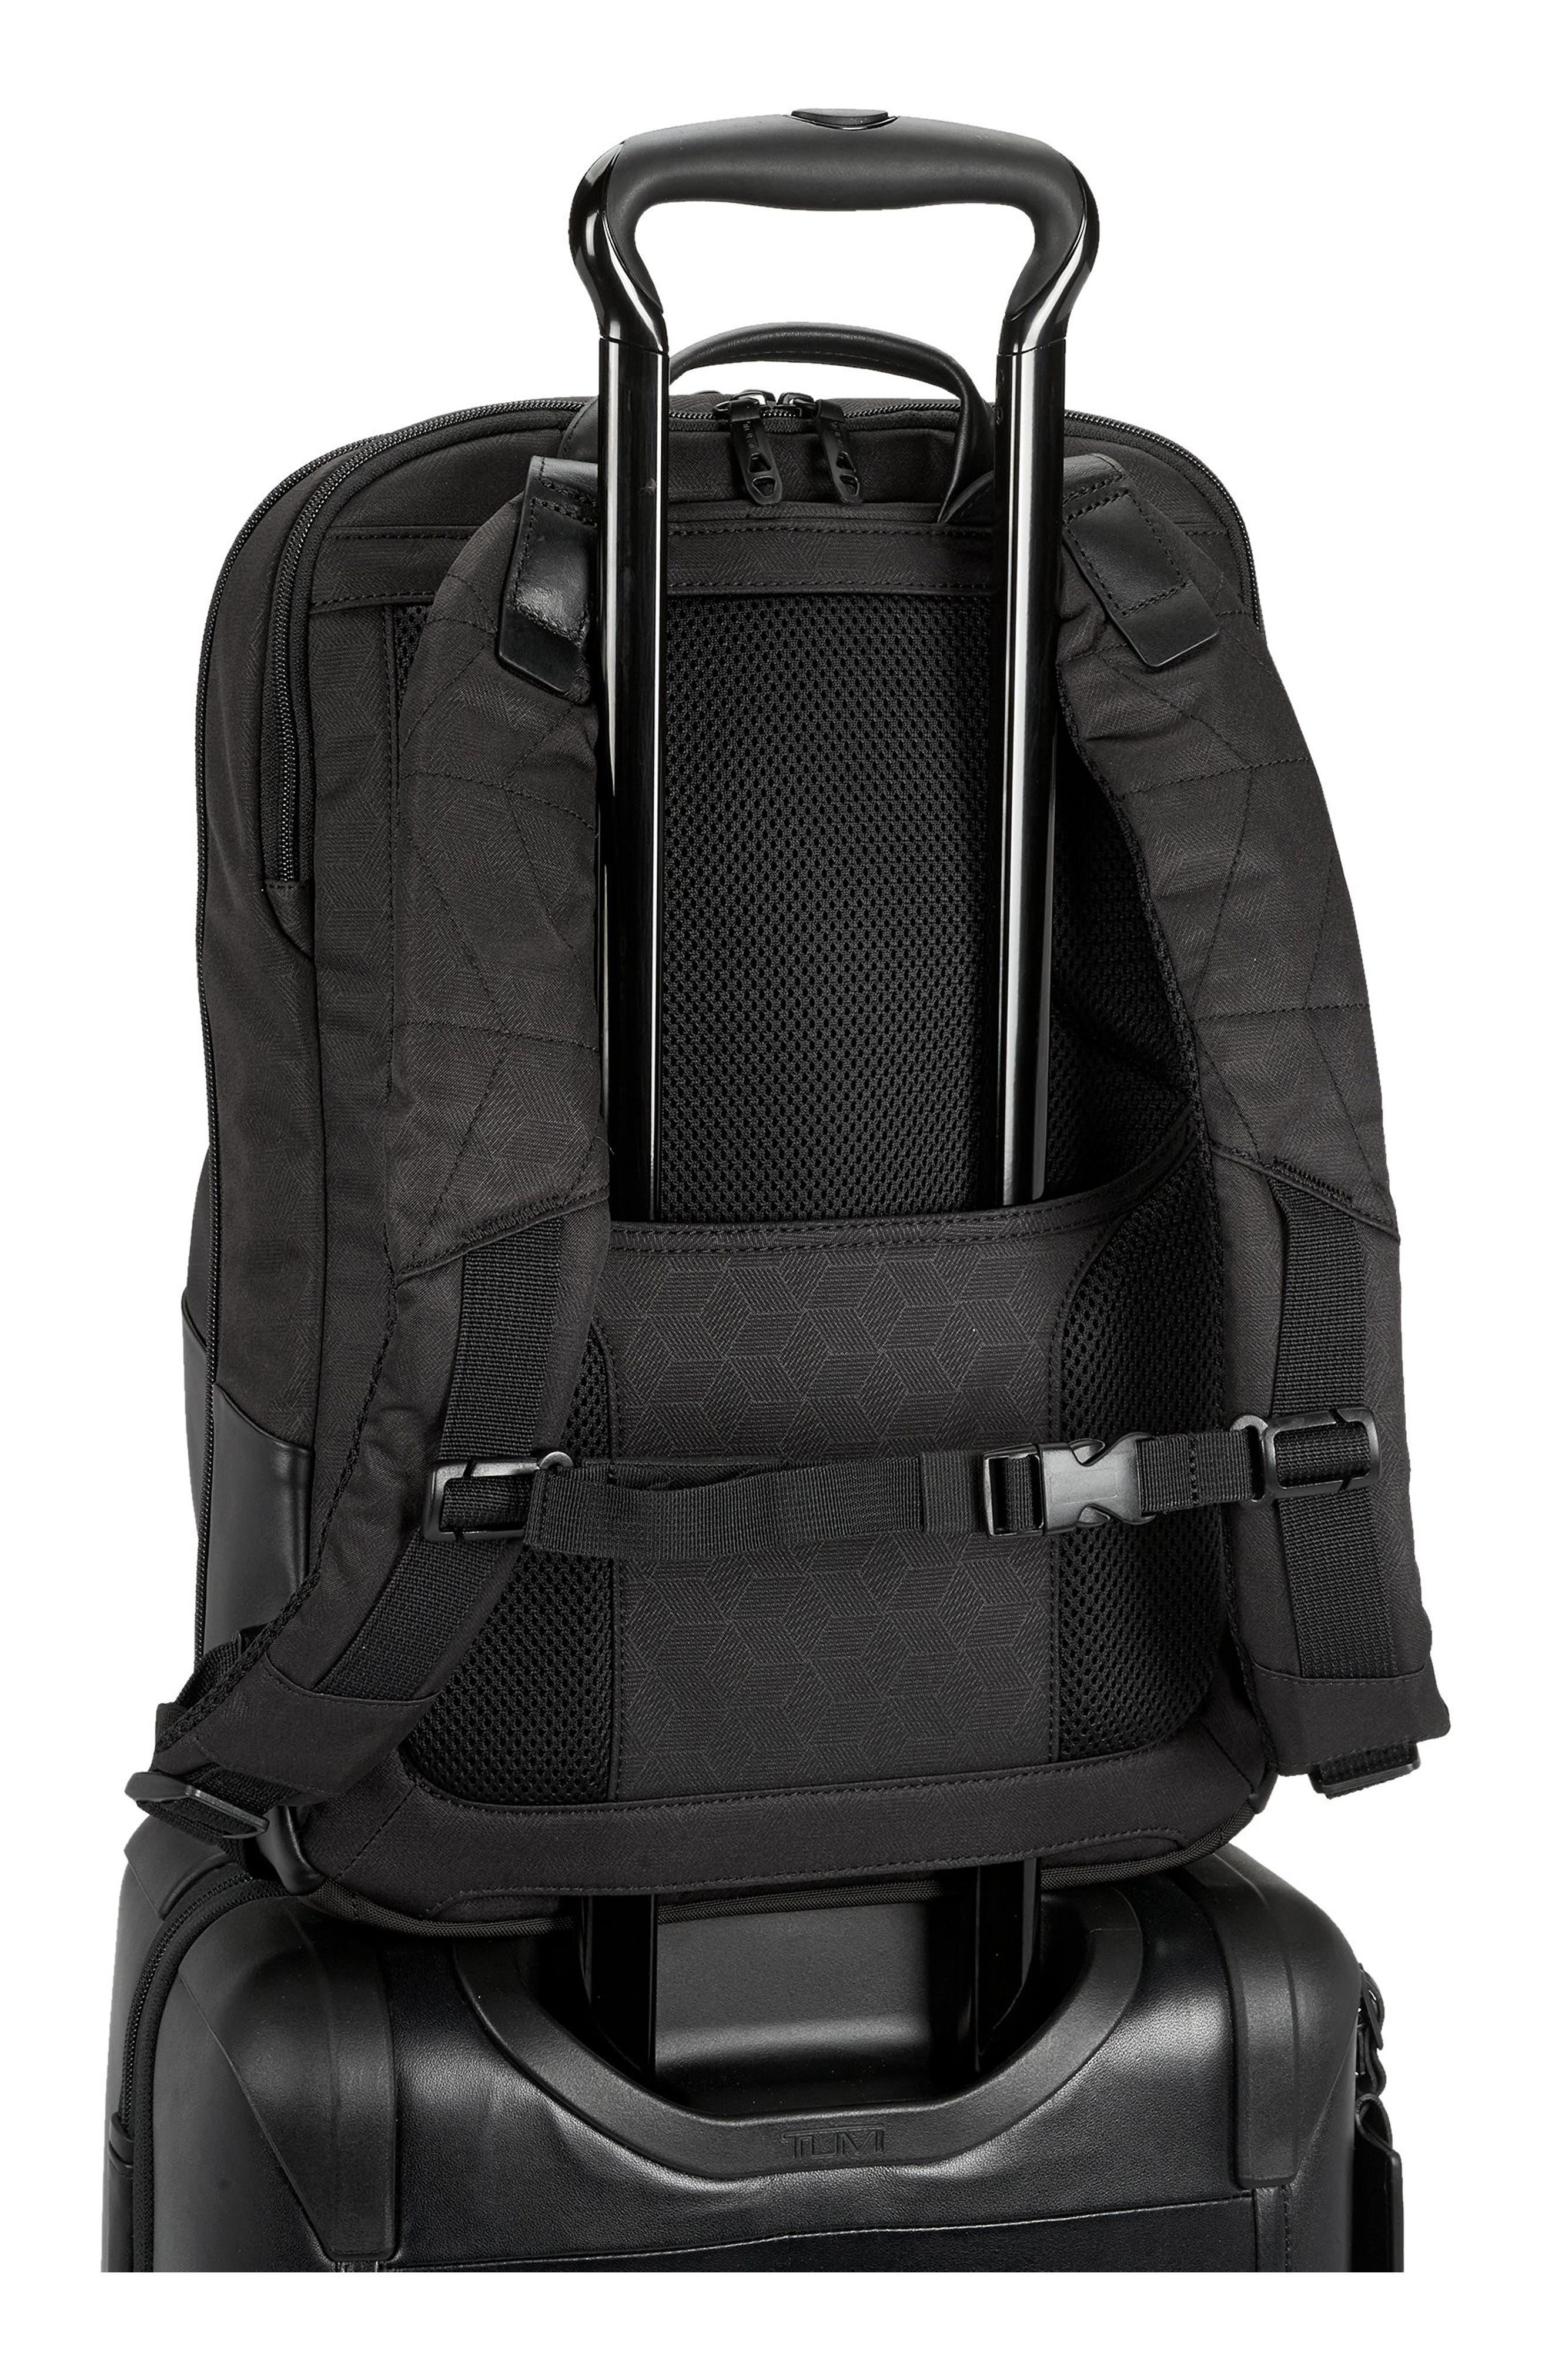 Butler Backpack,                             Alternate thumbnail 5, color,                             Black